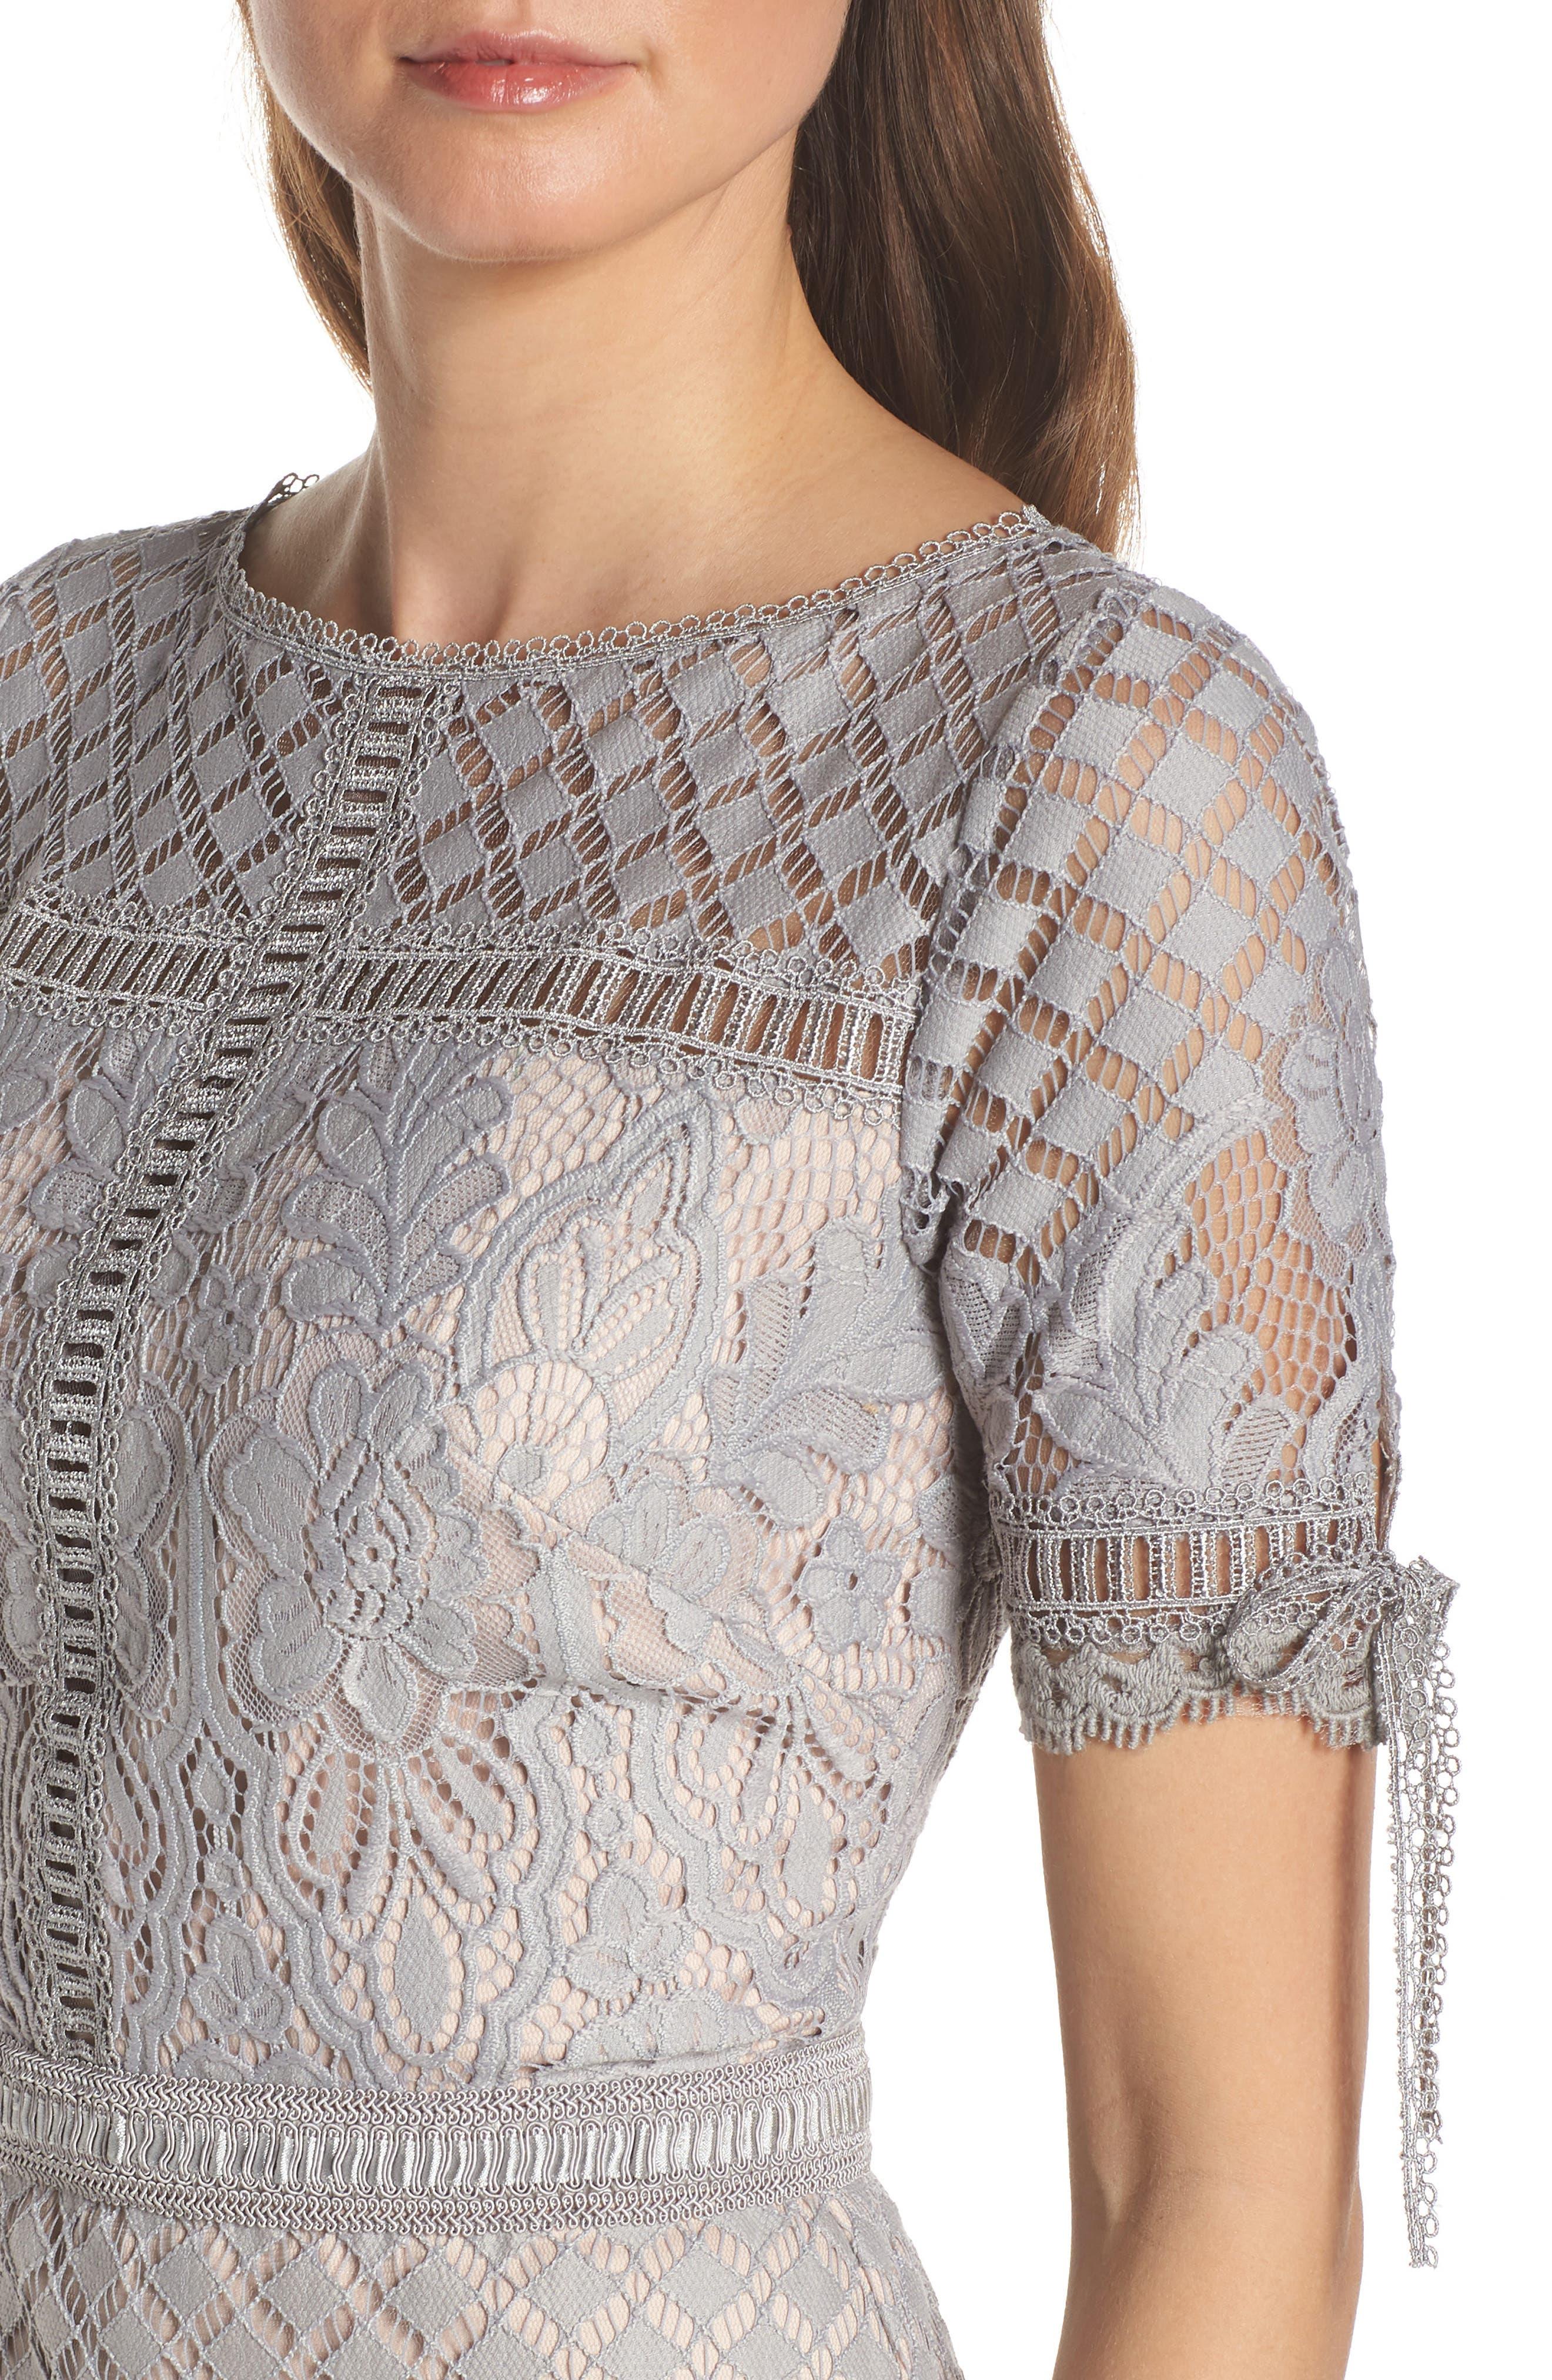 TADASHI SHOJI, Tie Sleeve Lace Sheath Dress, Alternate thumbnail 5, color, PEWTER/ PETAL